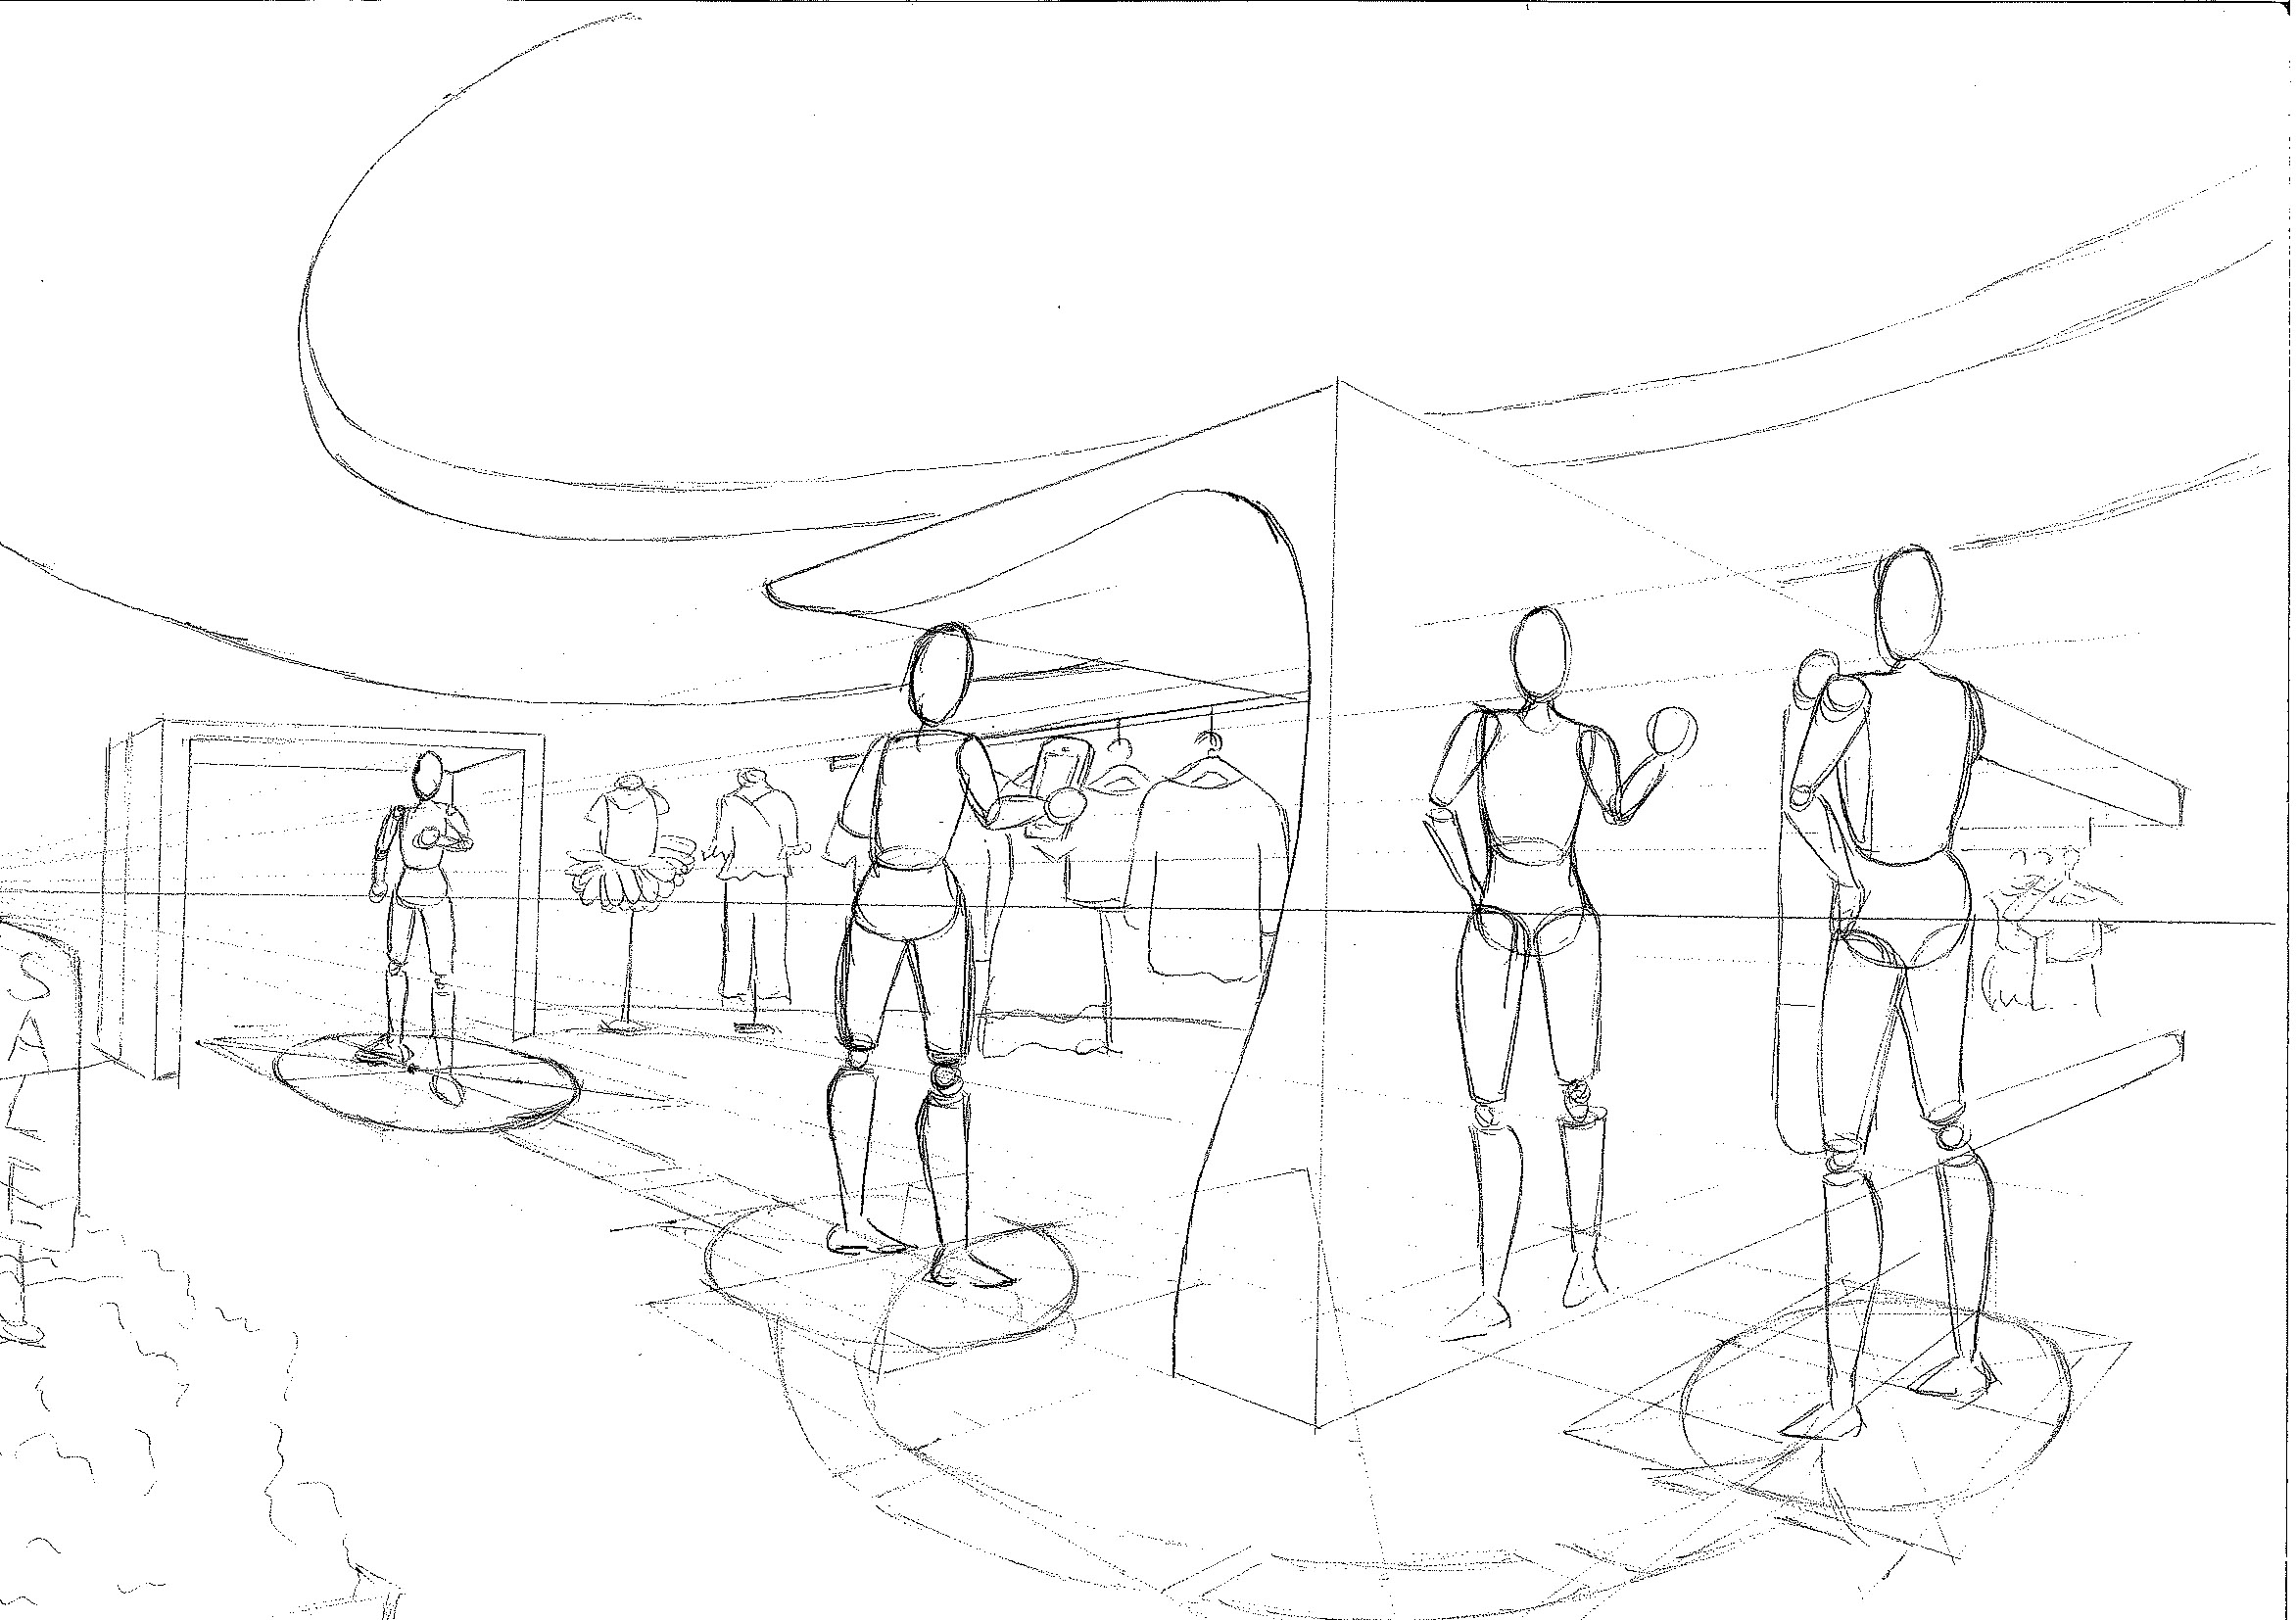 Interactive Mirror (Draft)